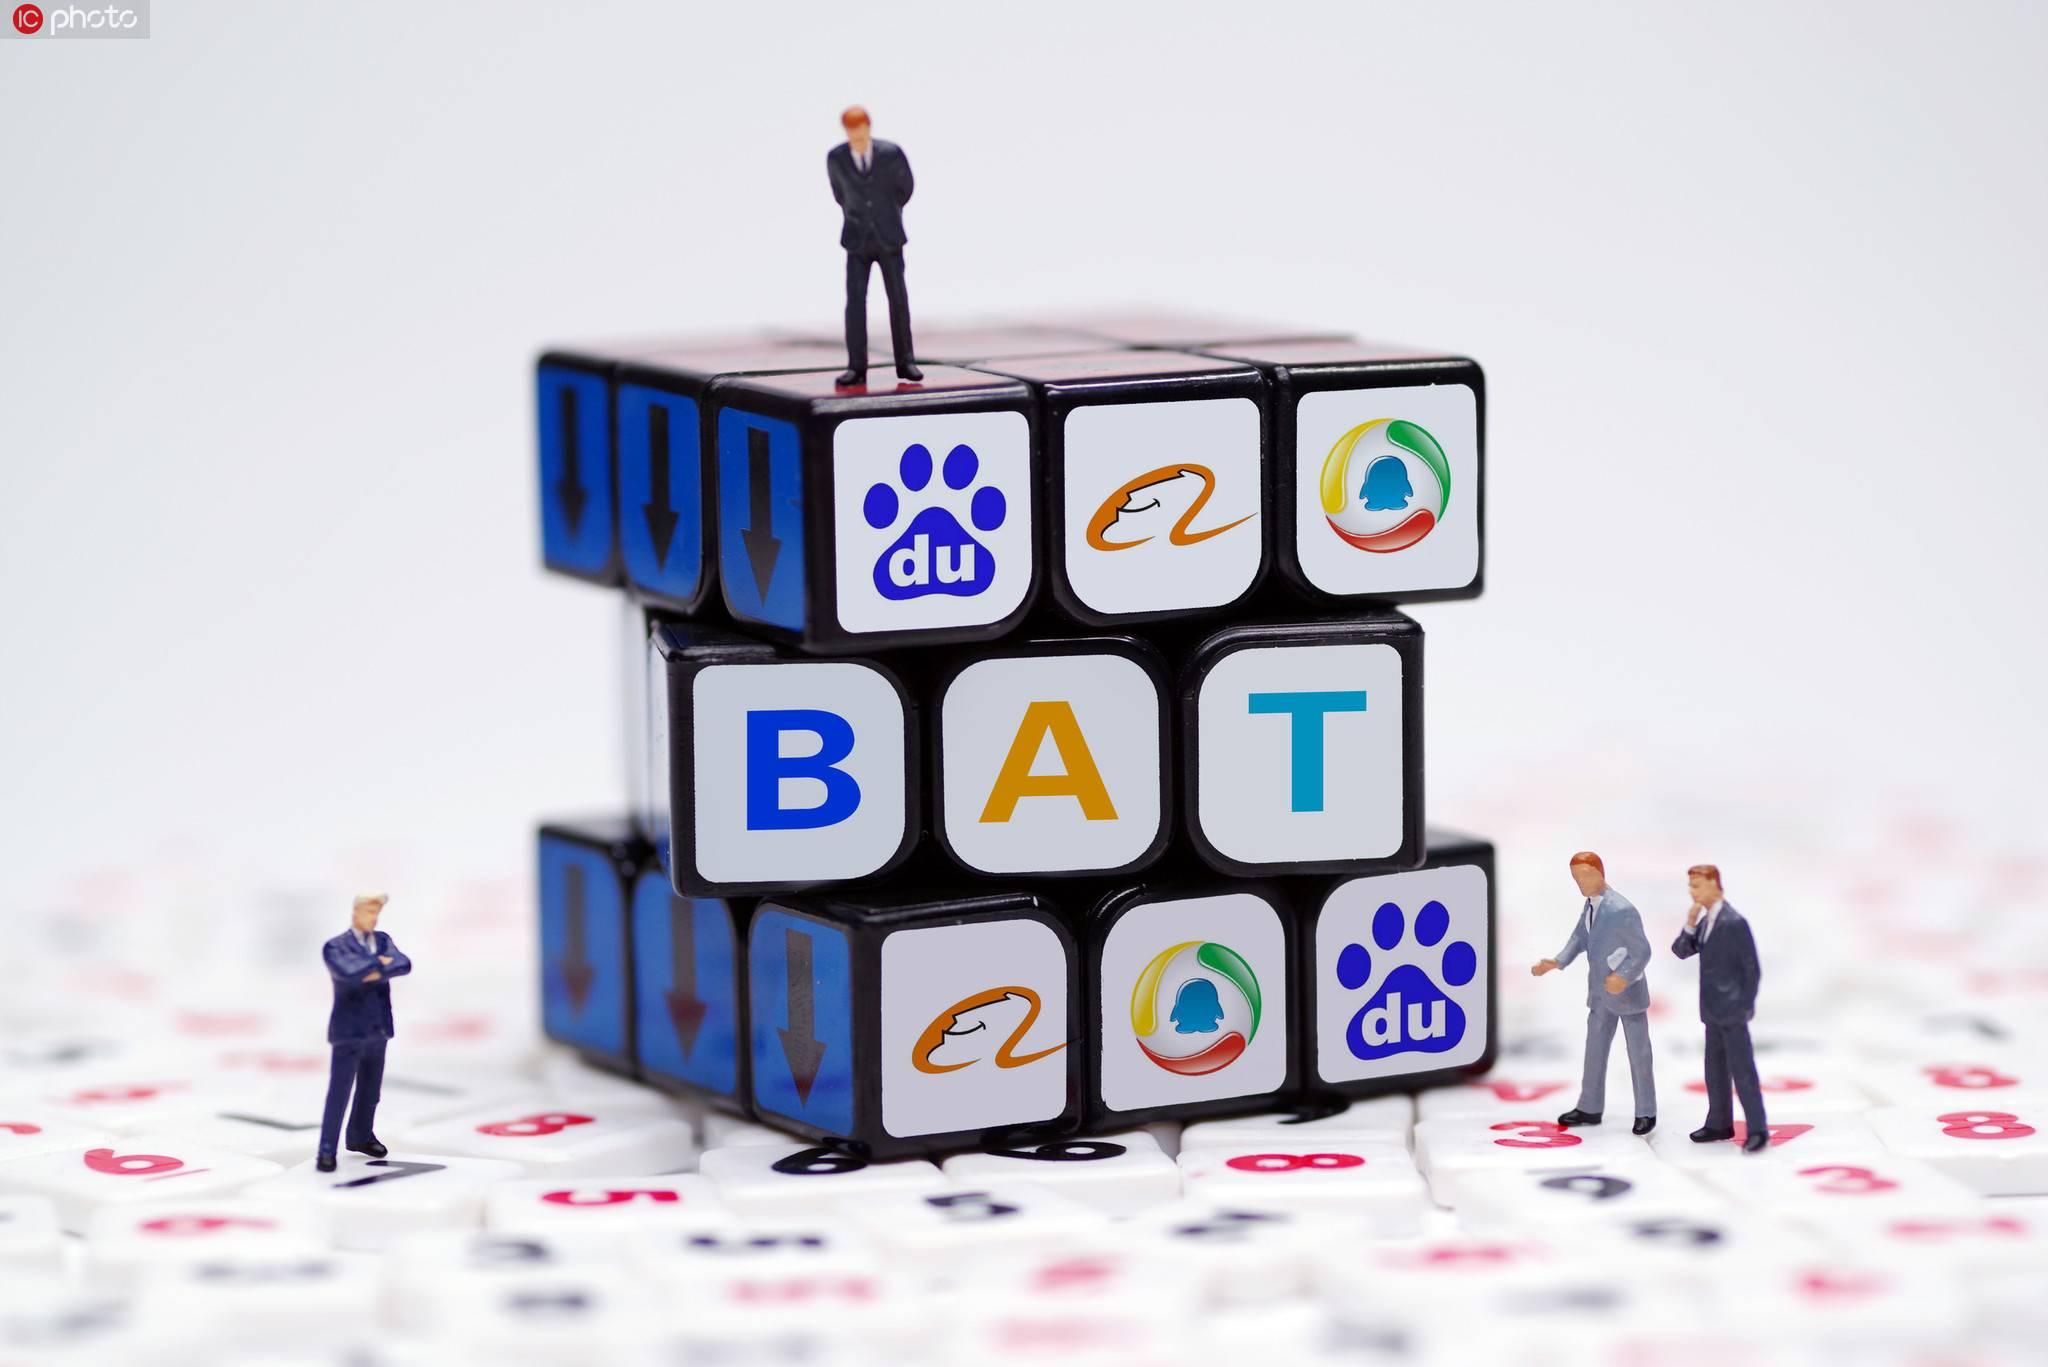 BAT,BAT,阿里,腾讯,阿里云,2019年财报,百度2019年上半年财报